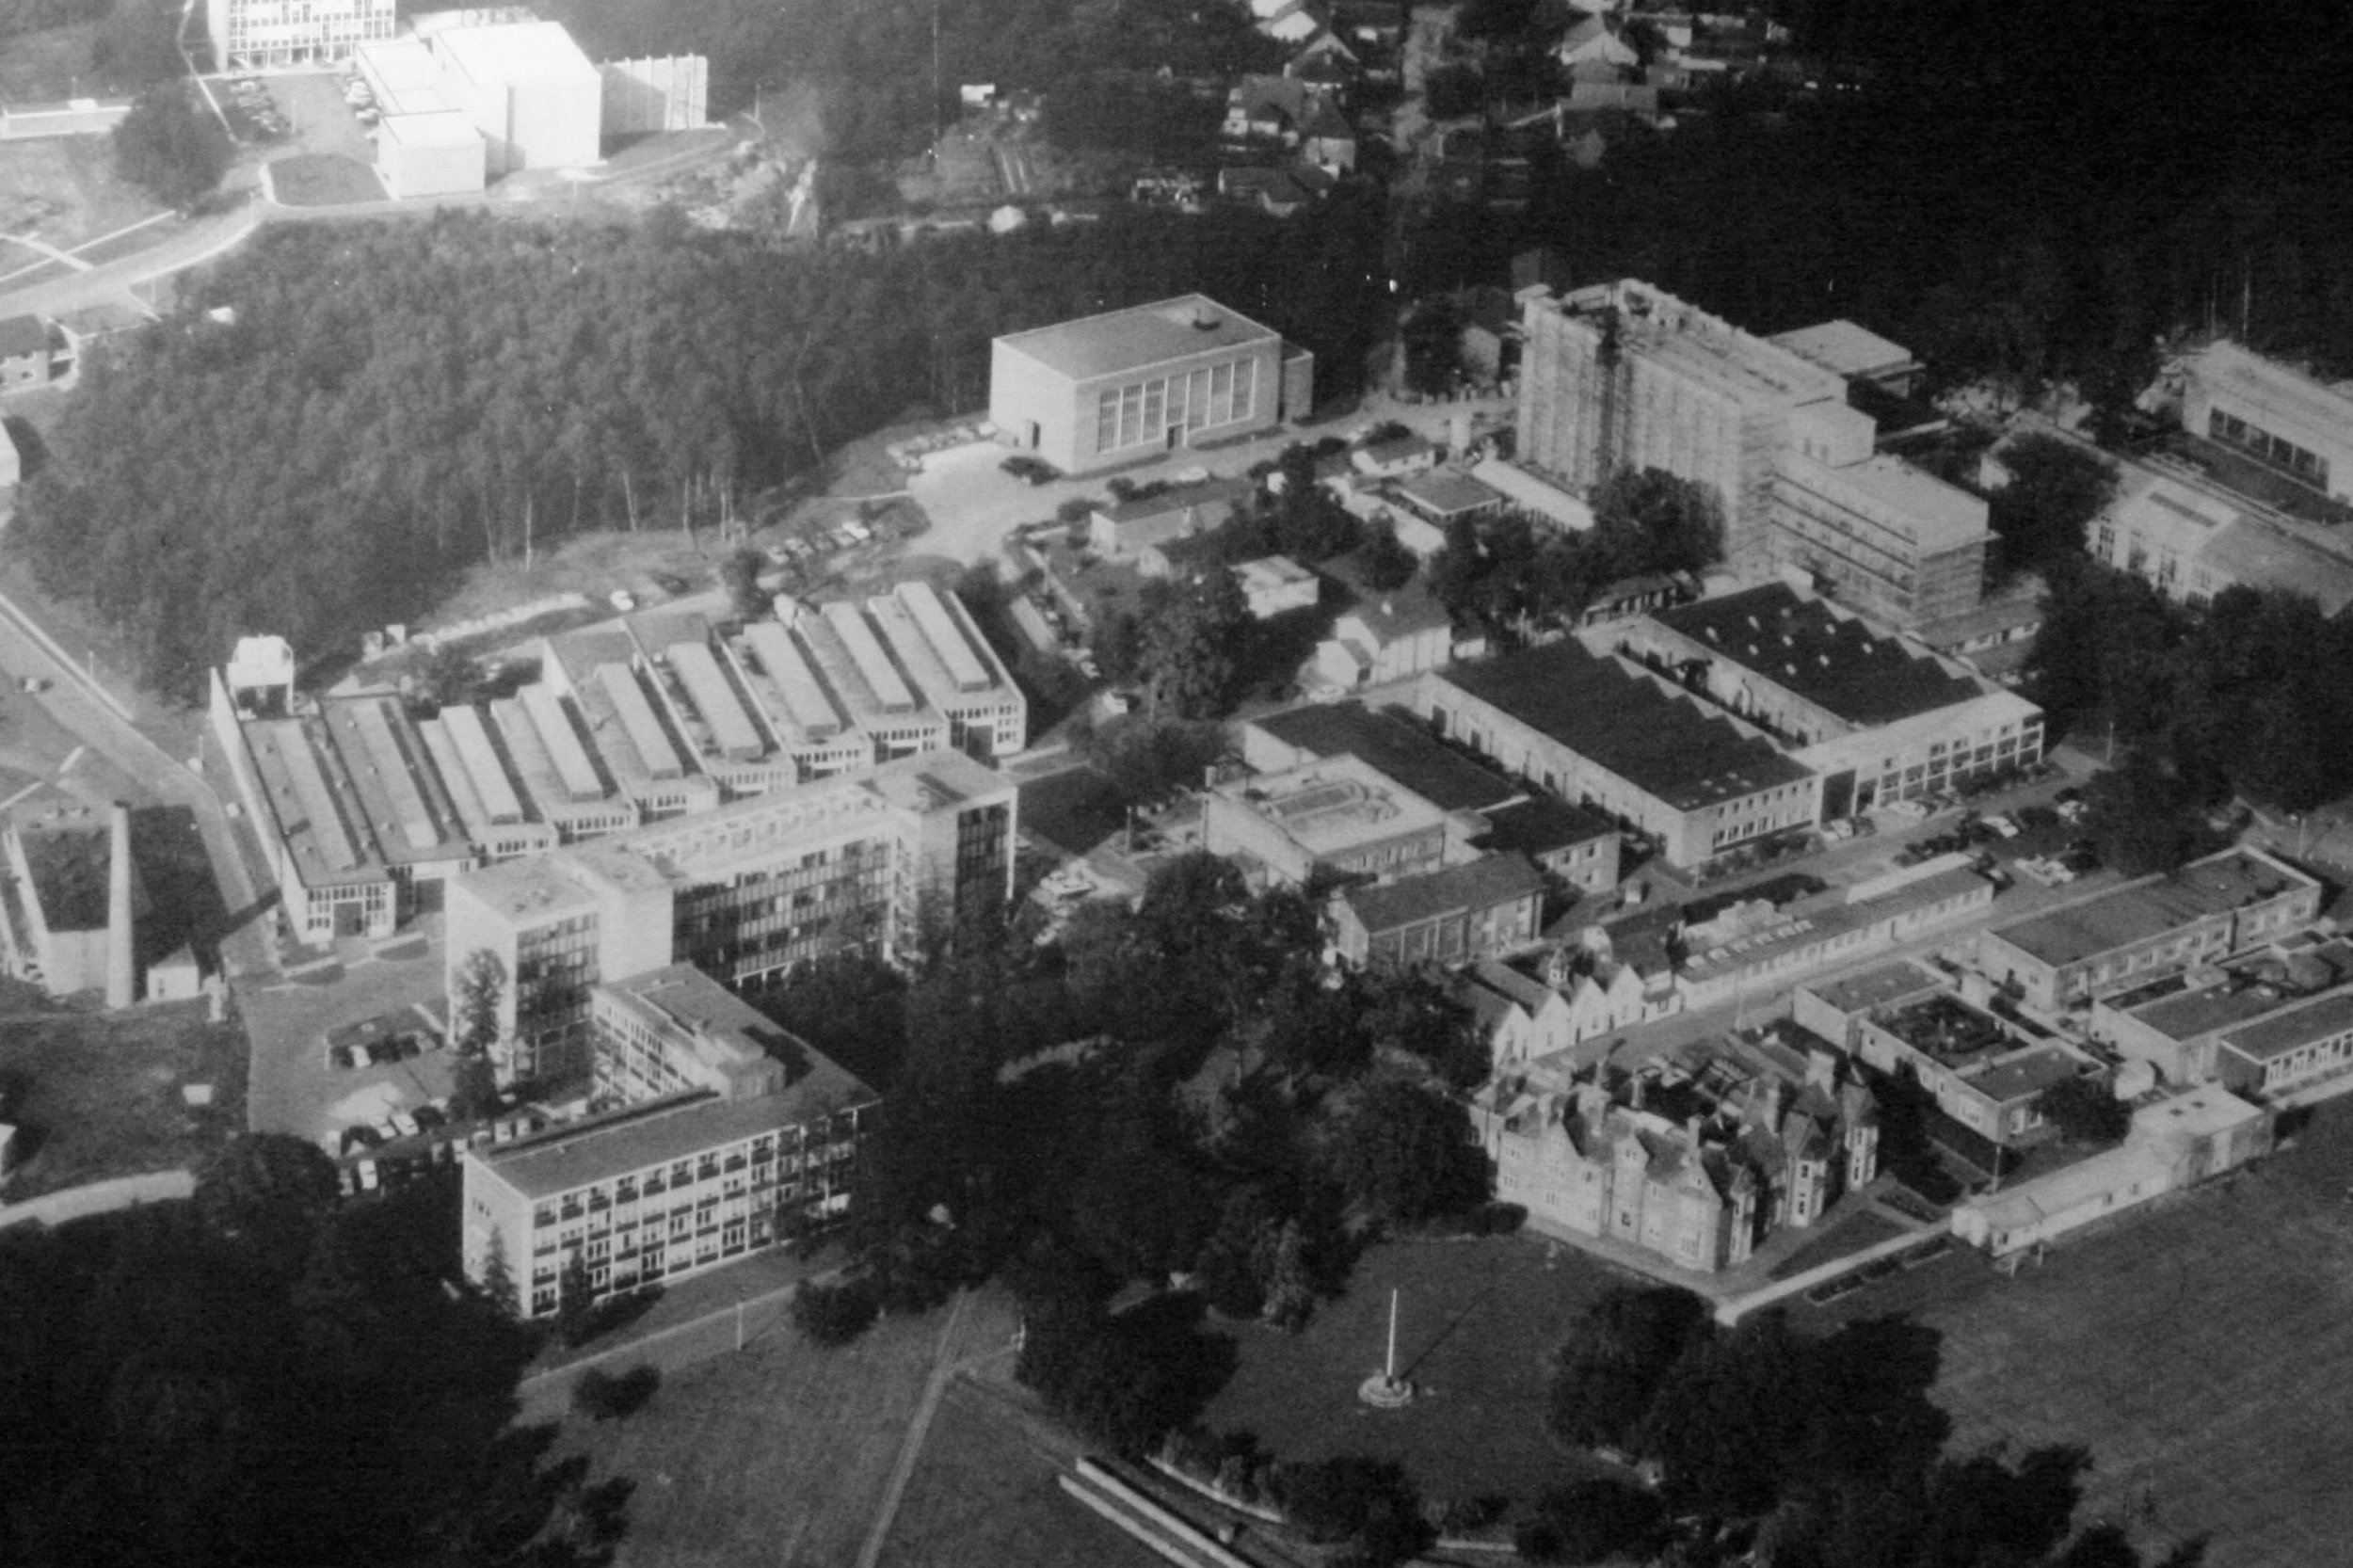 Historic Photos of Building Research Establishment Campus